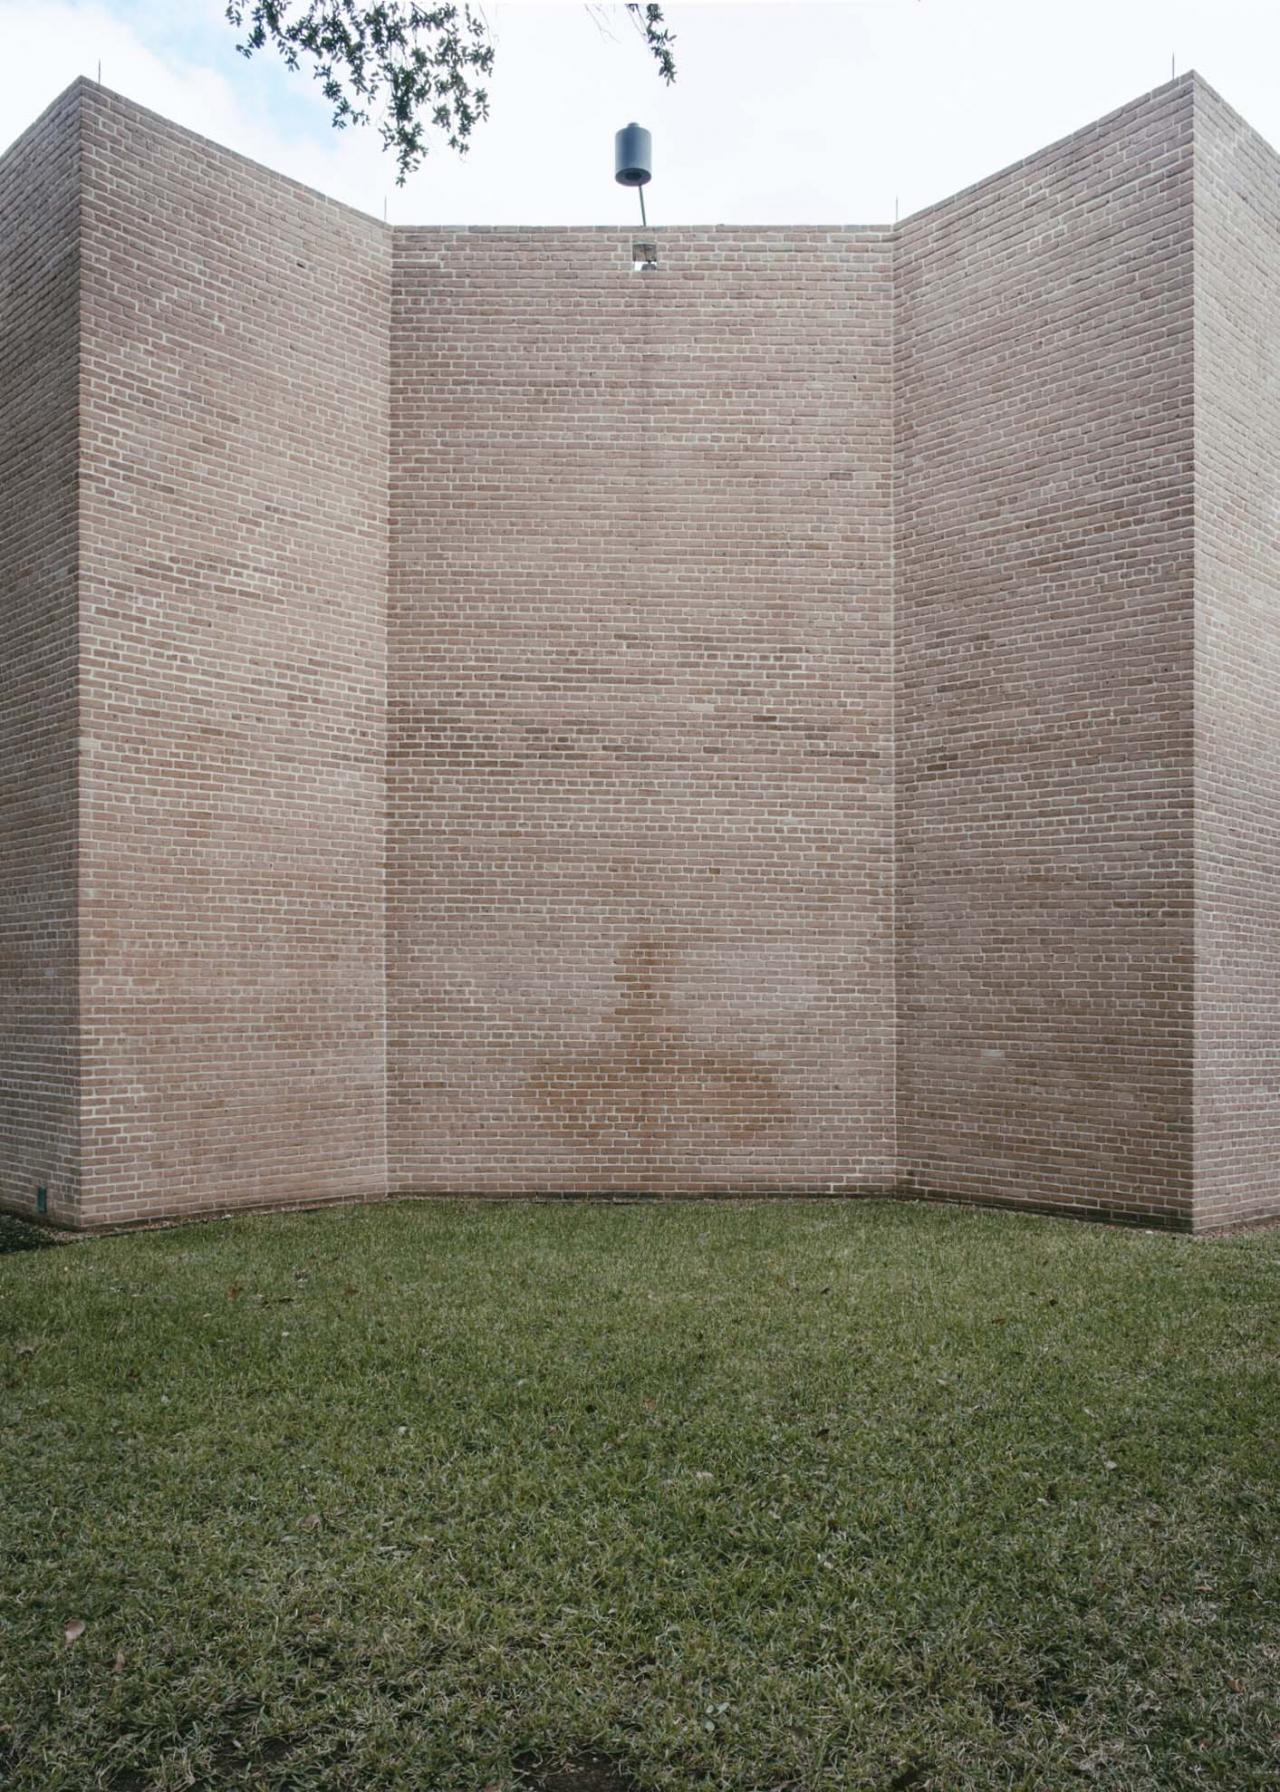 Lukas Schramm Fotografie Mark Rothko Chapel in Houston, Texas